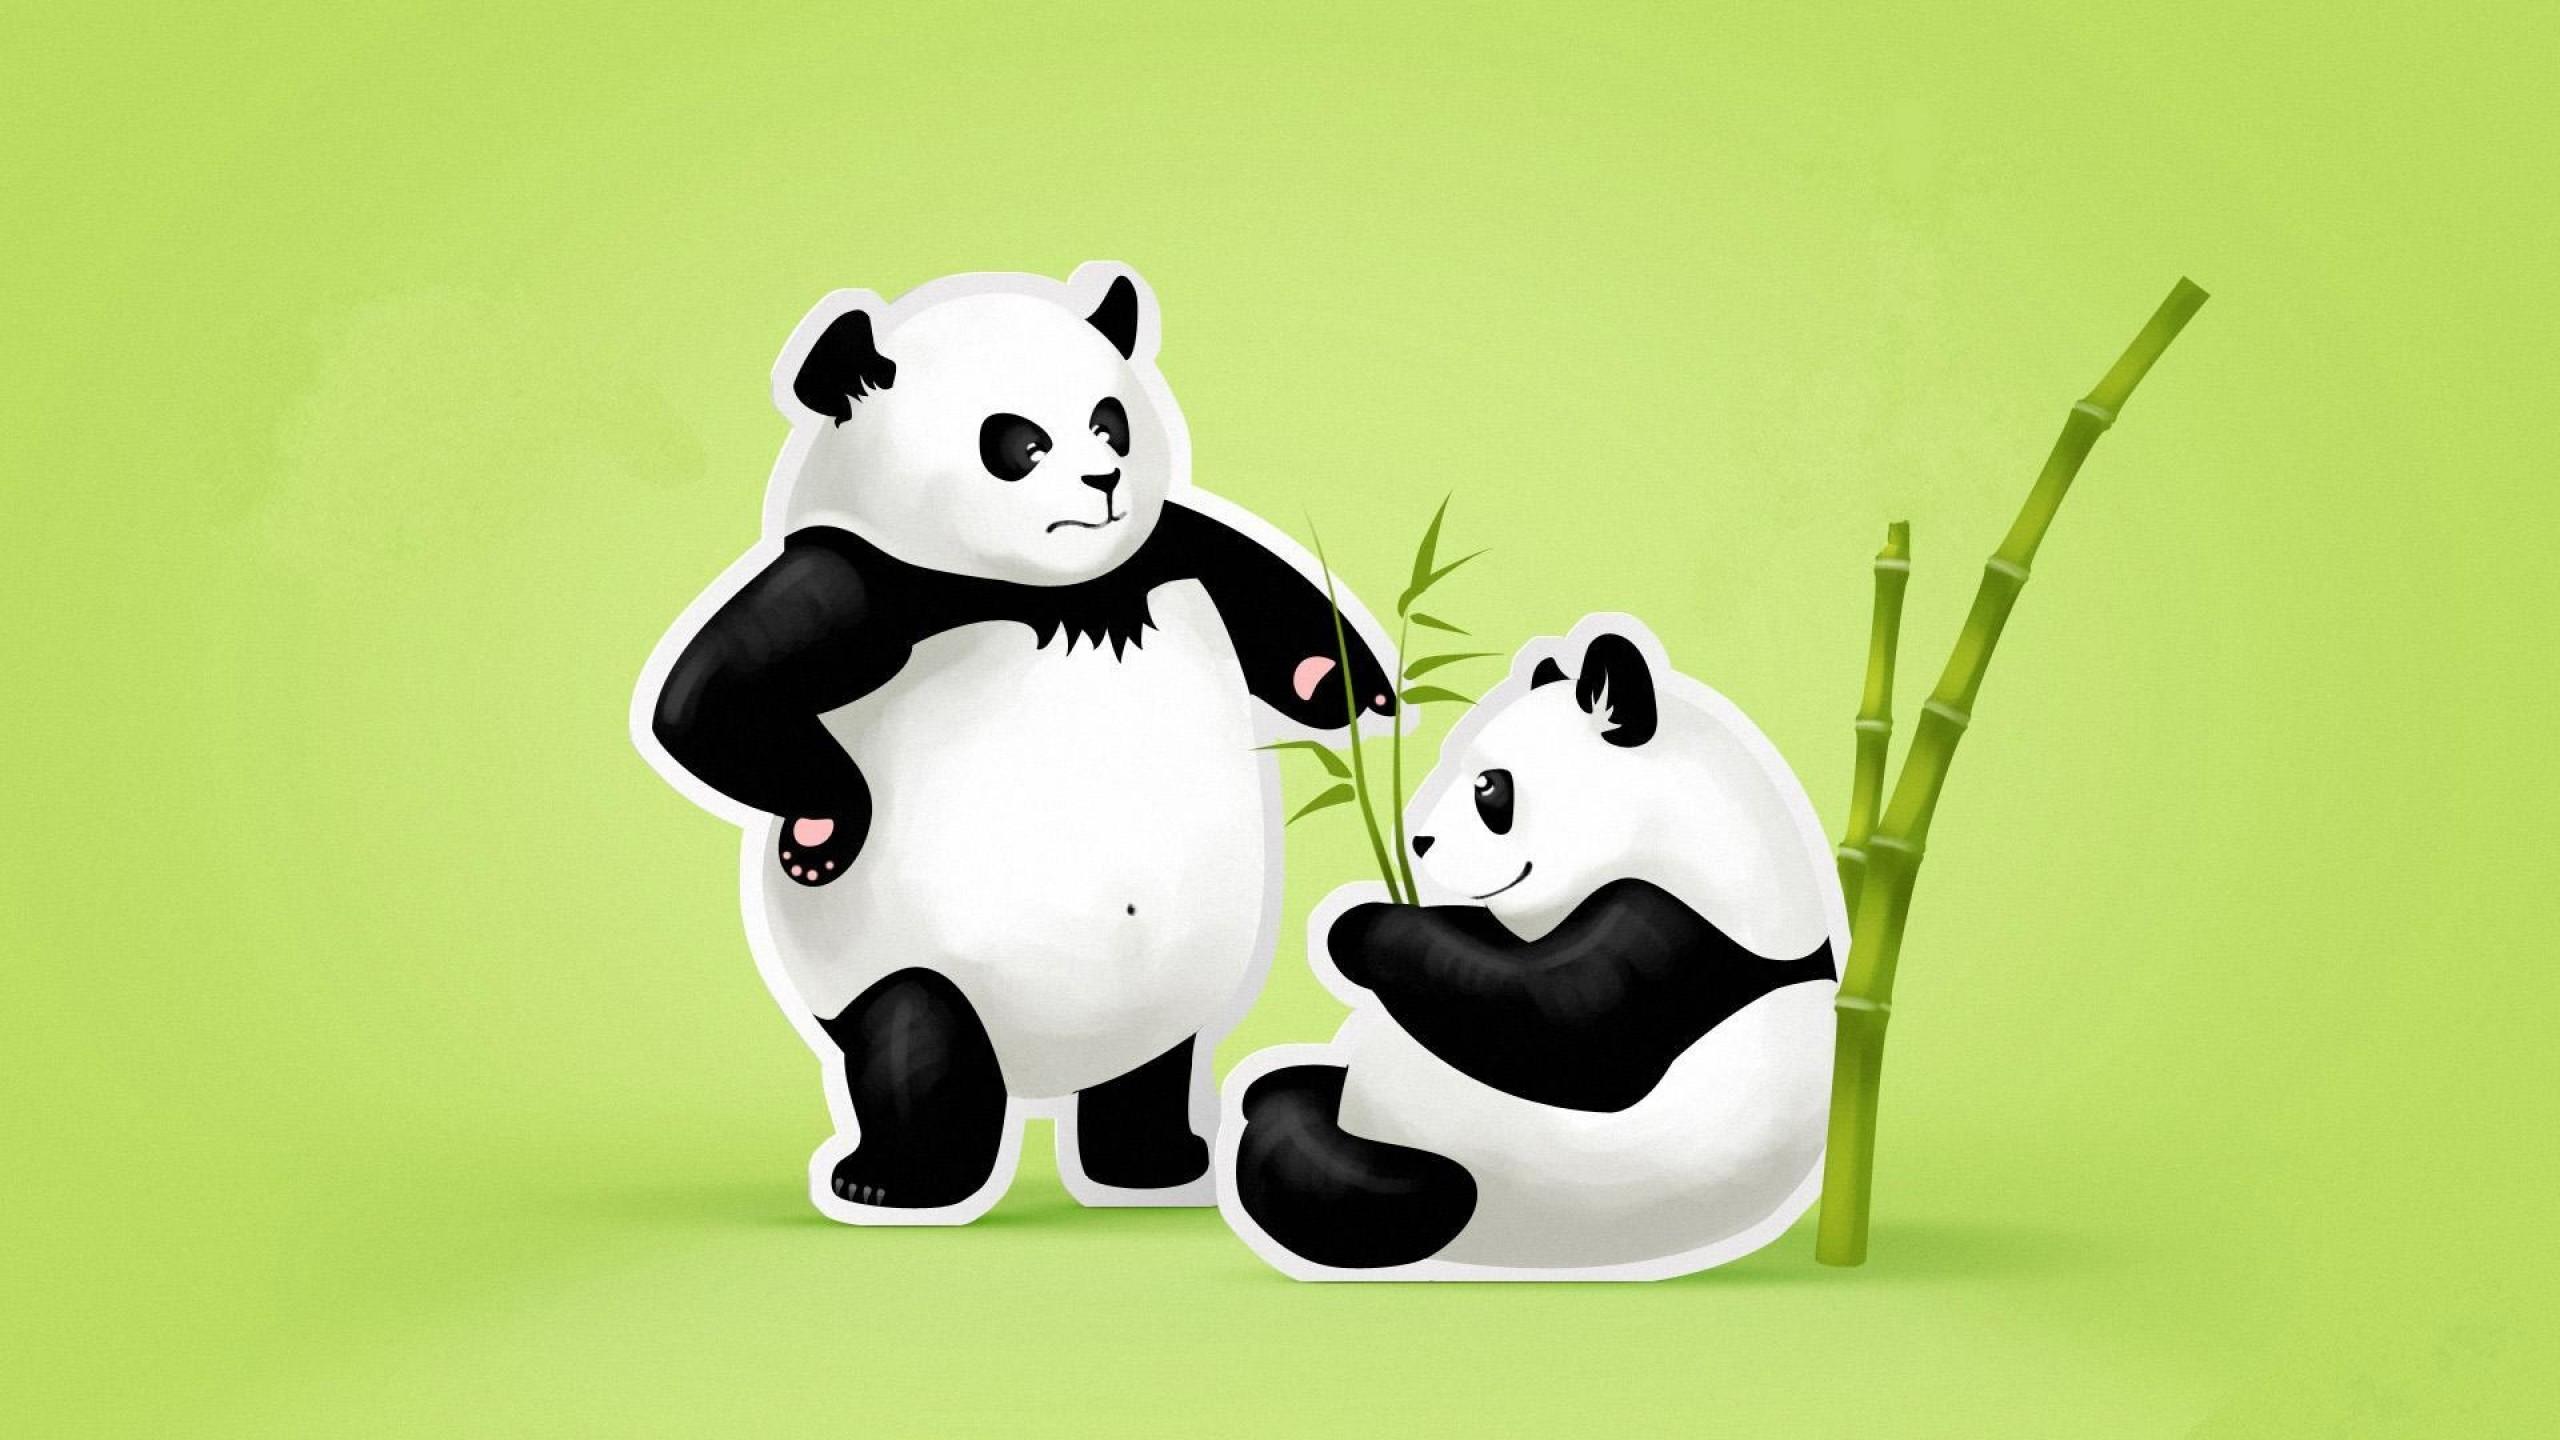 Wallpaper panda, couple, threat, quarrel, green, black, white